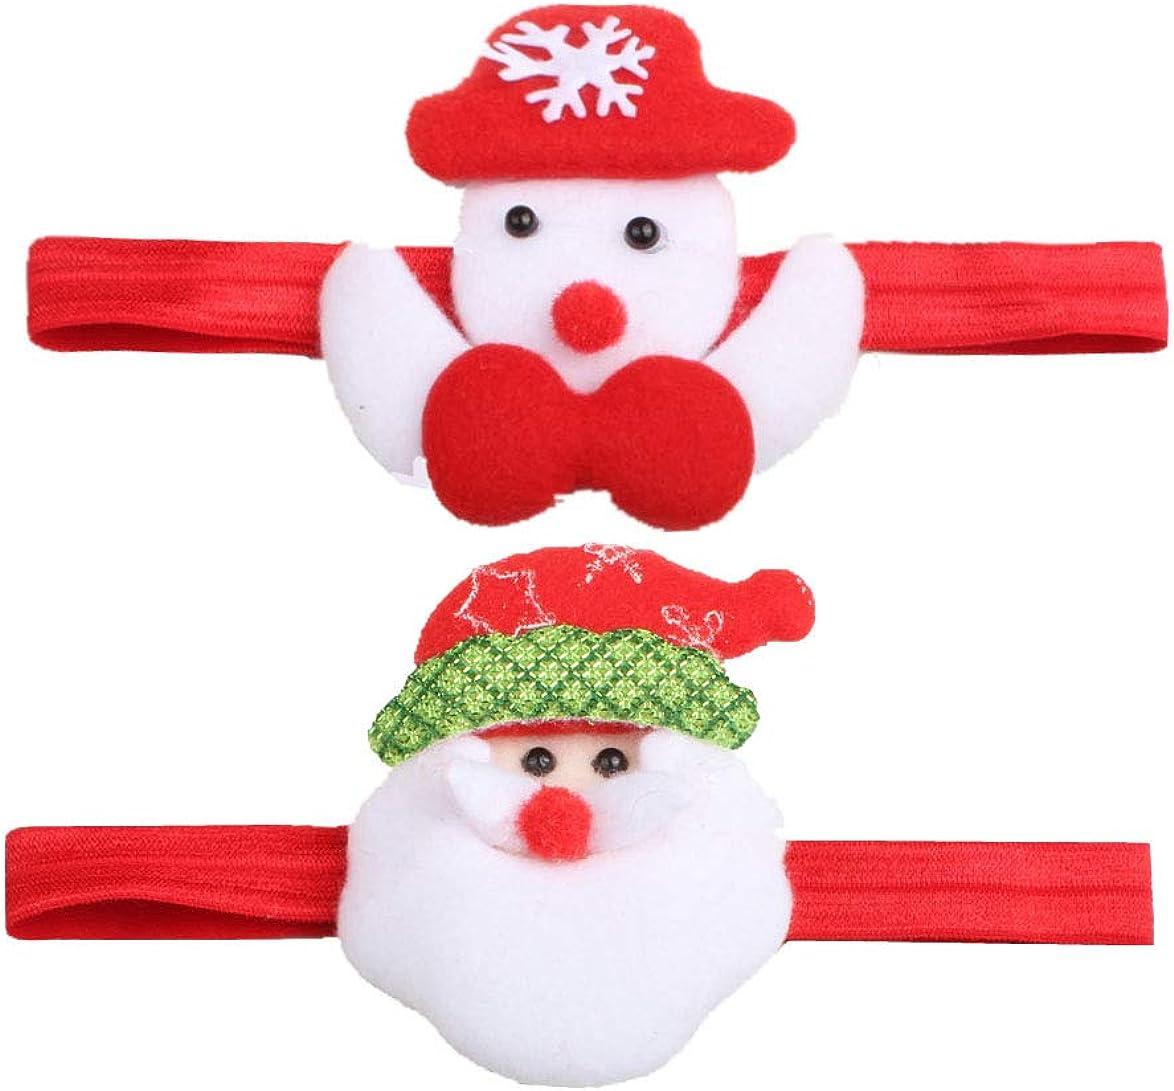 Christmas Headband for Baby Girls Turban Santa Claus Snowman Deer Hair Band JHC68